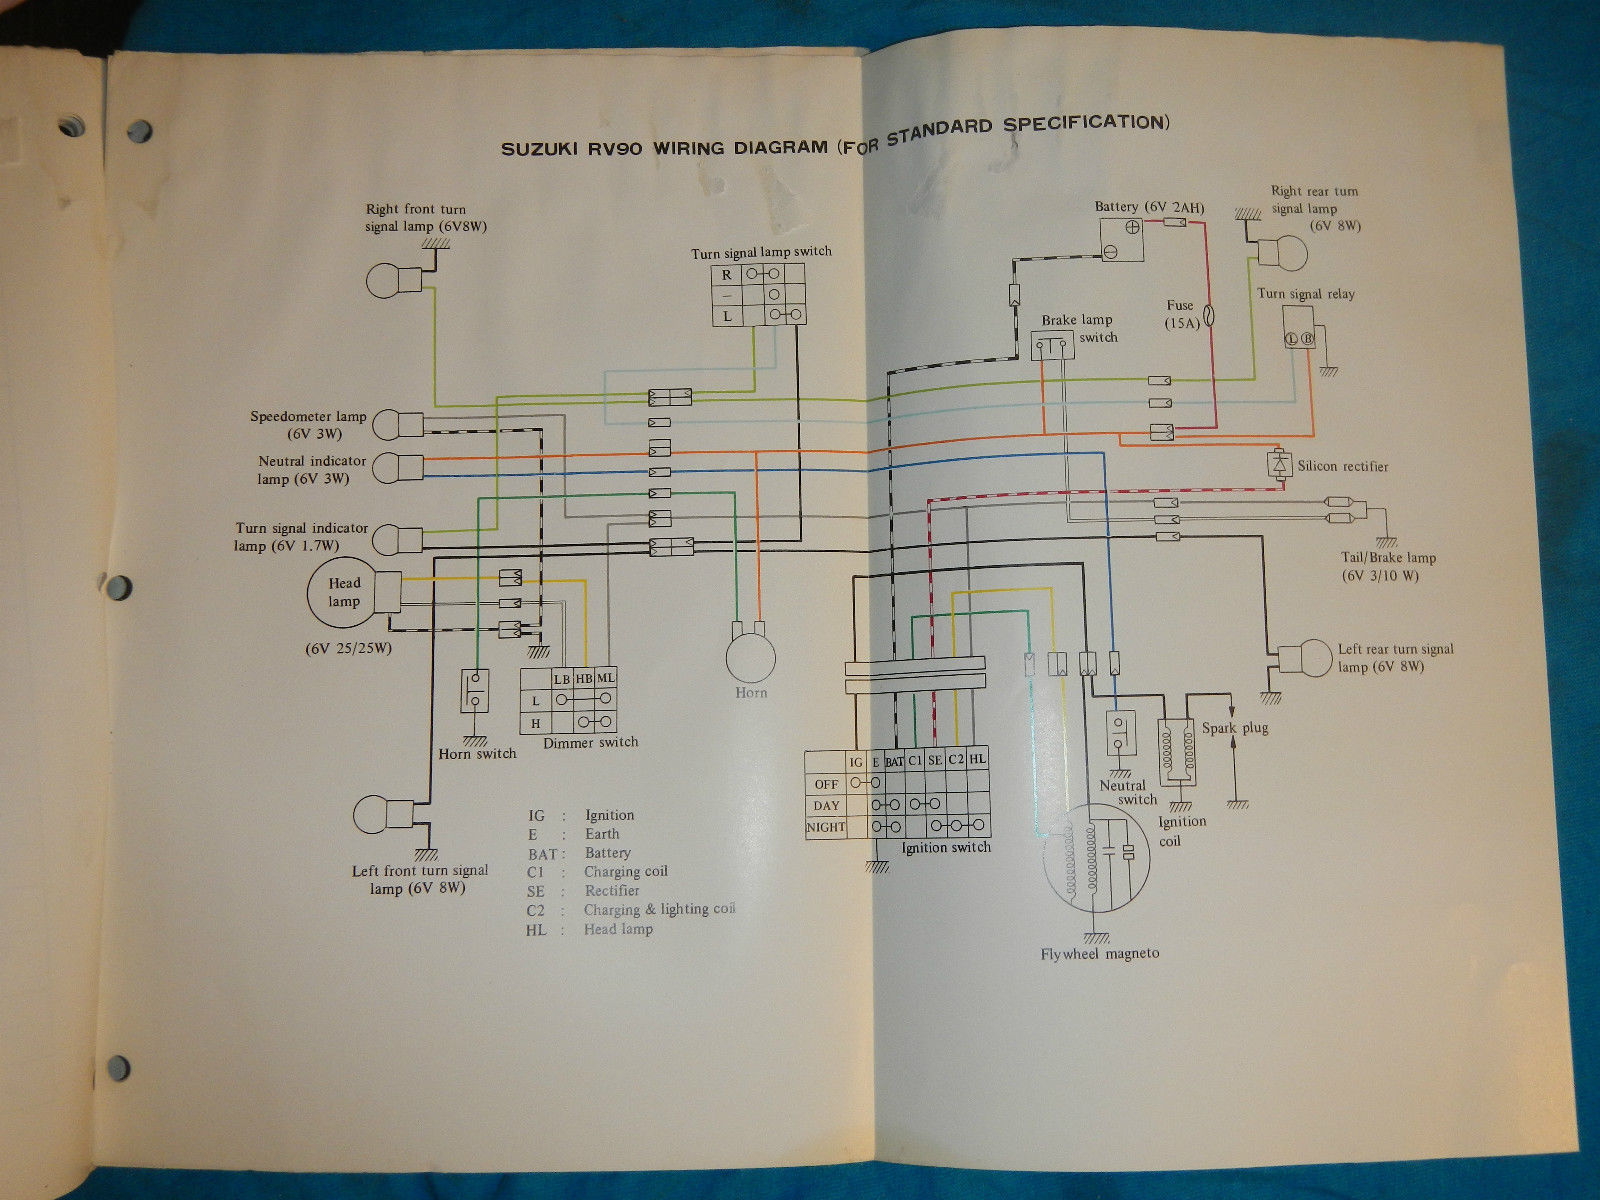 suzuki rv 90 wiring diagram - wiring diagram schema launch-river -  launch-river.iltrovatorevercelli.it  iltrovatorevercelli.it